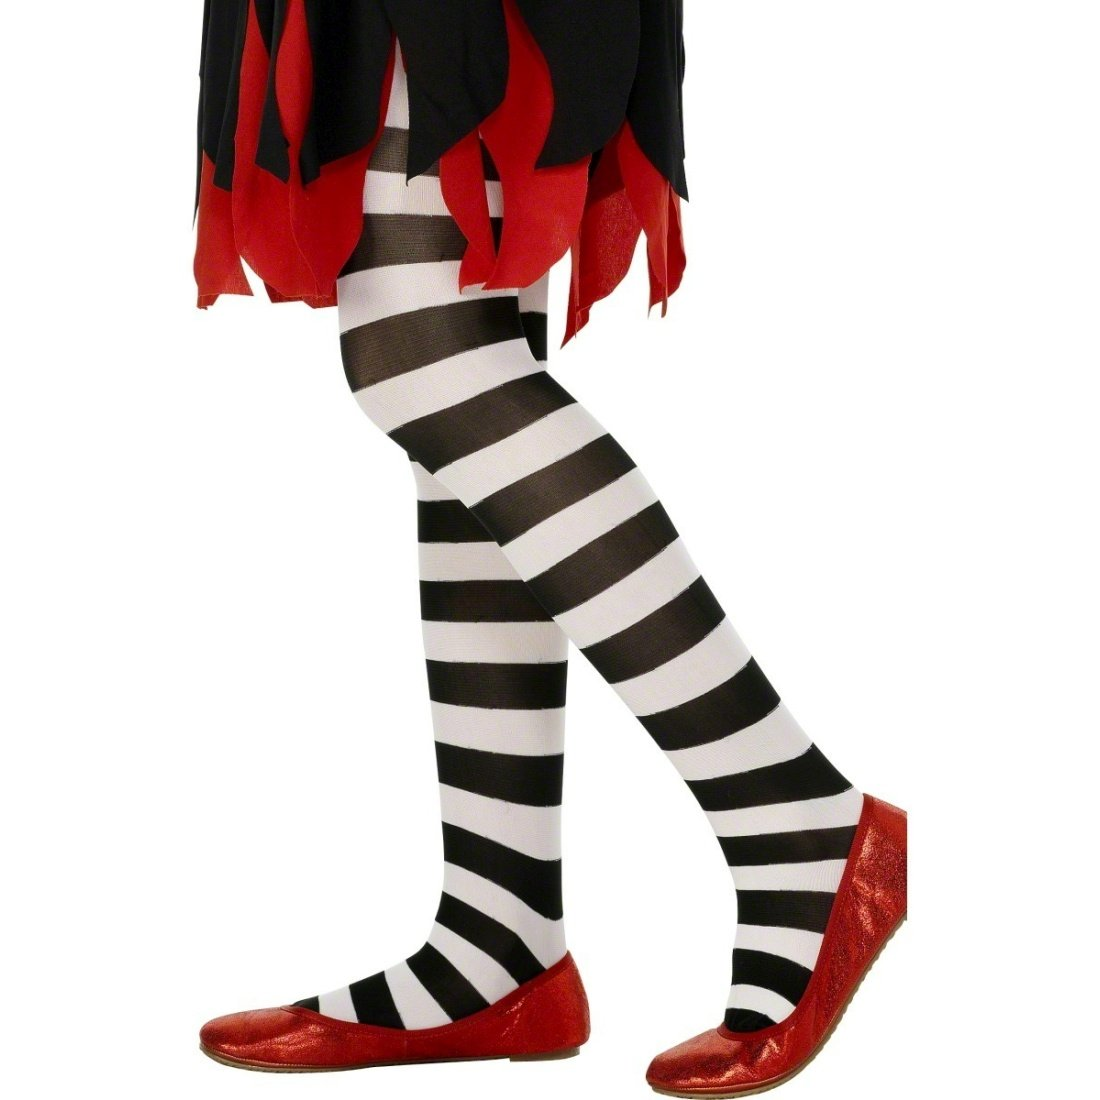 Amakando Striped pantyhose kids Children tights black and white Colorful pantihose stripy panty hose Child costume Accessory leggings